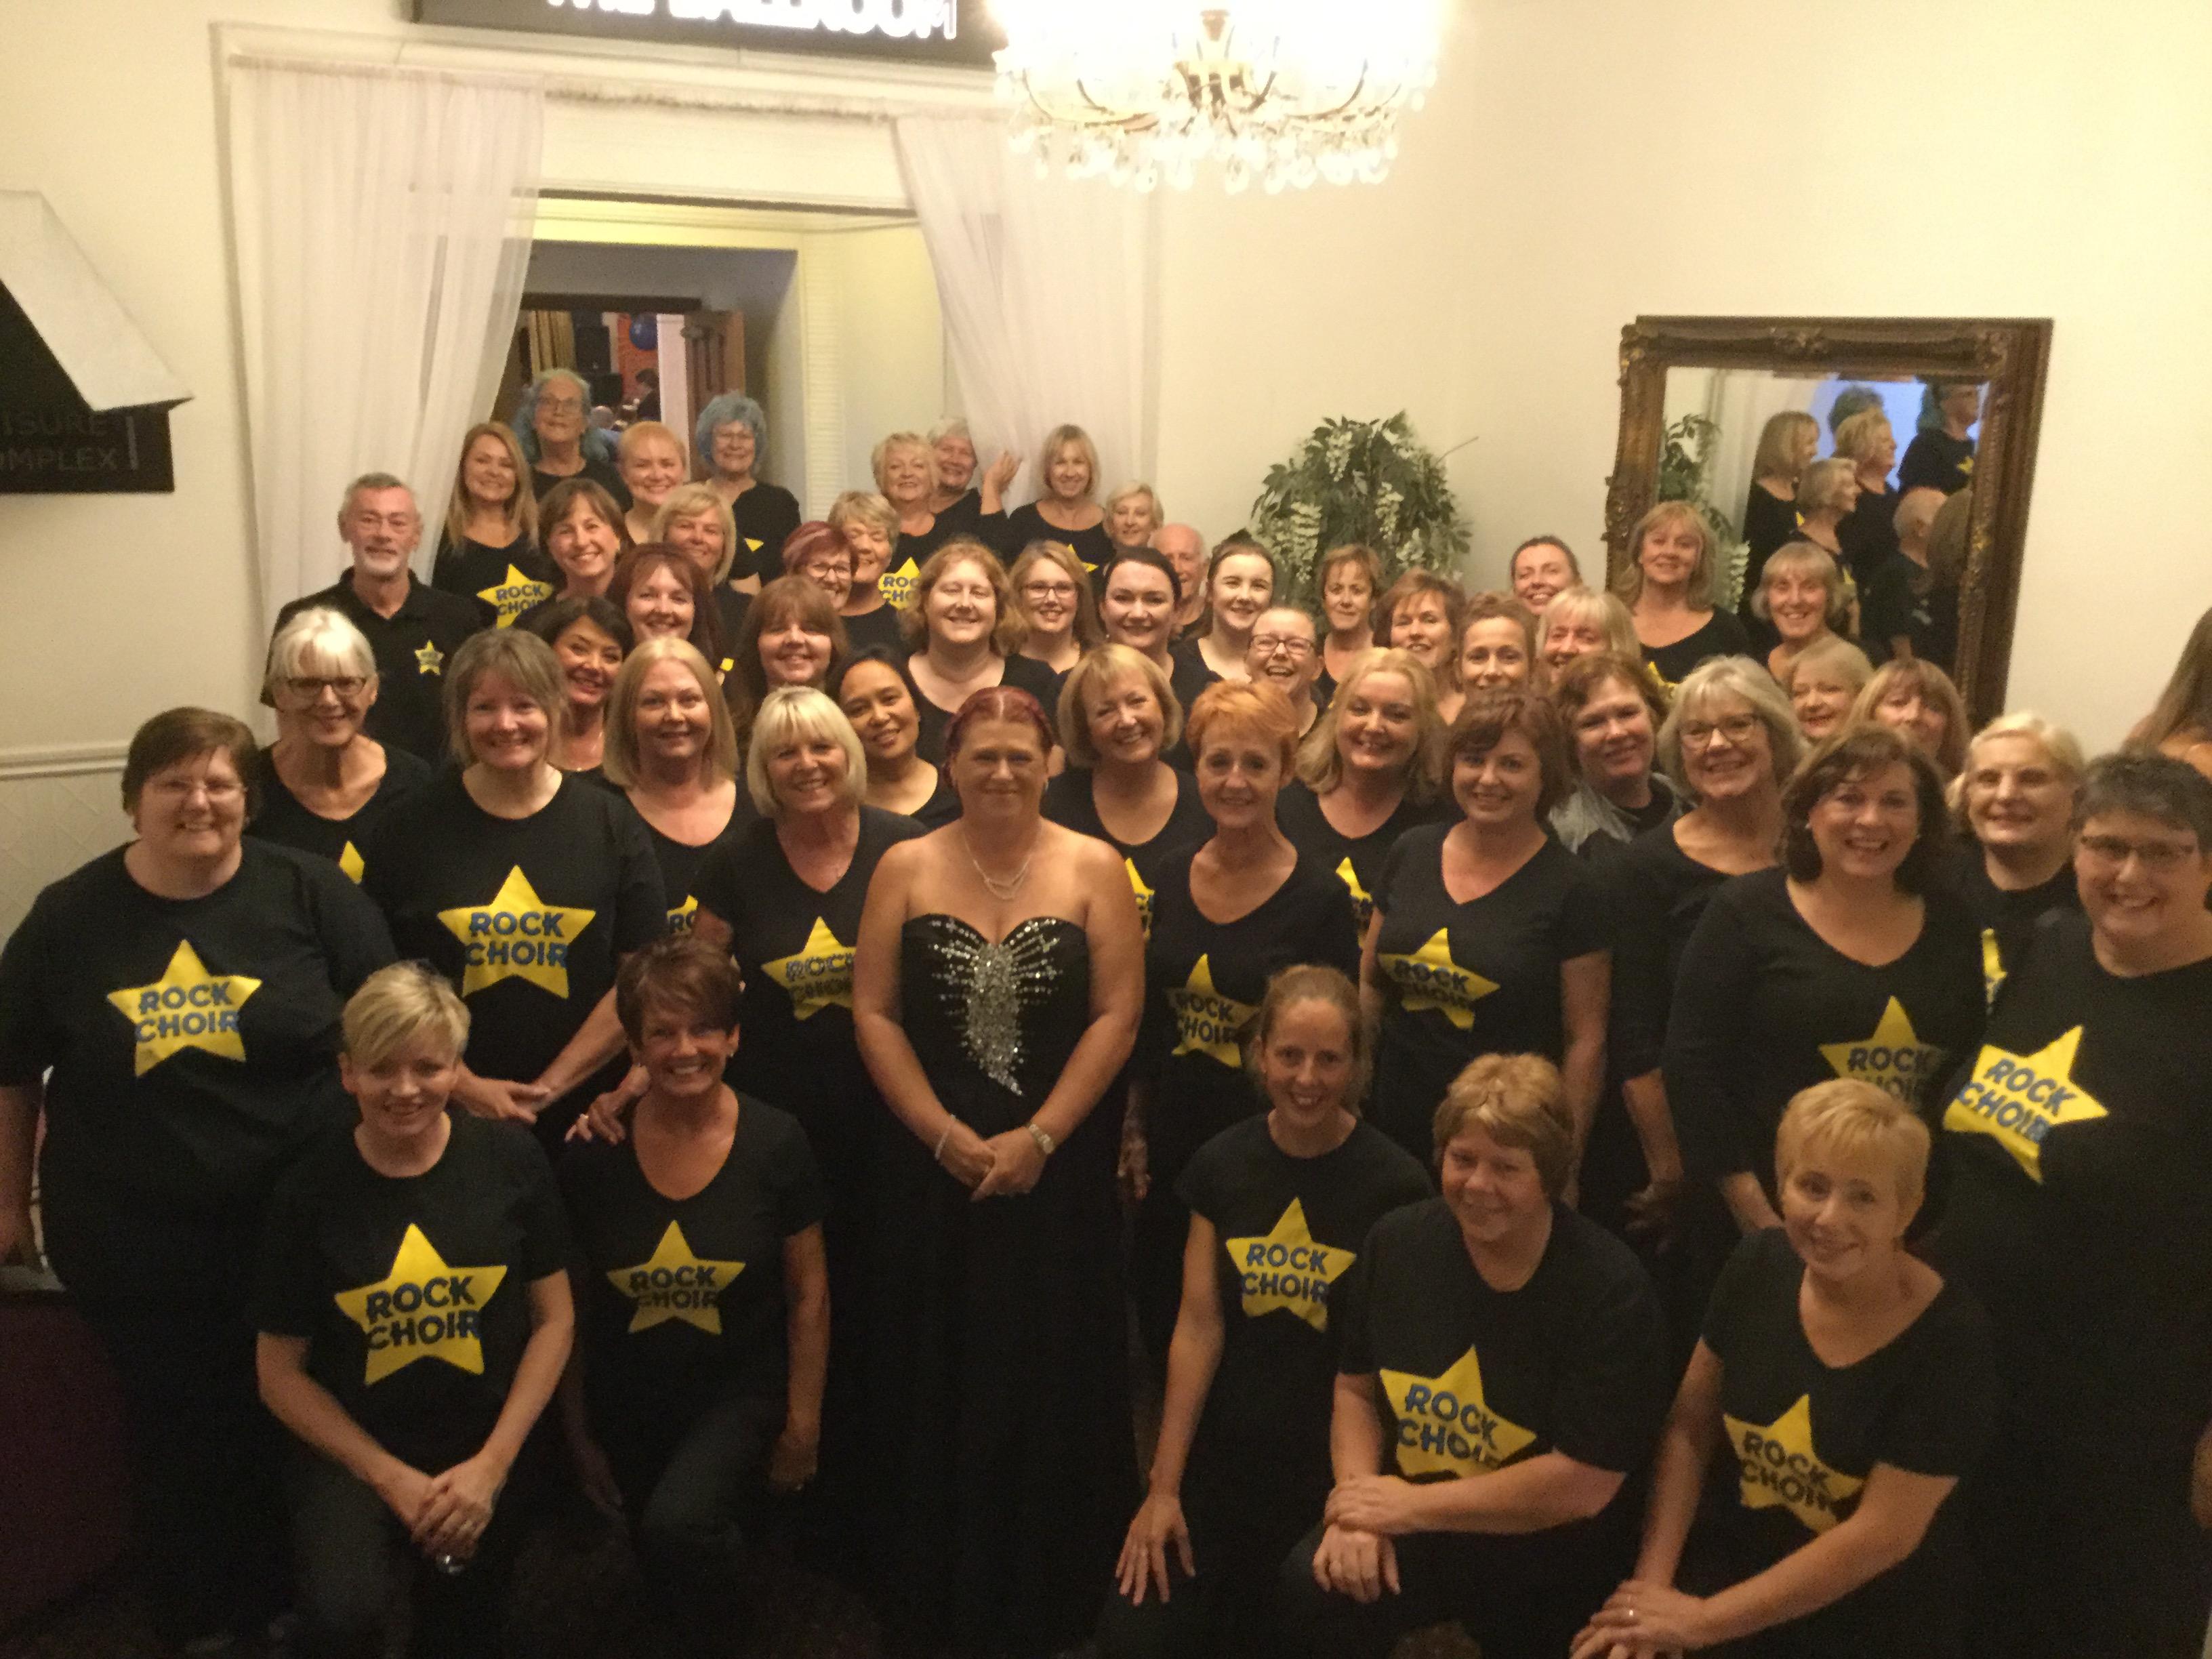 Rock Choir Flash Mob Stroke Association Charity Dinner!